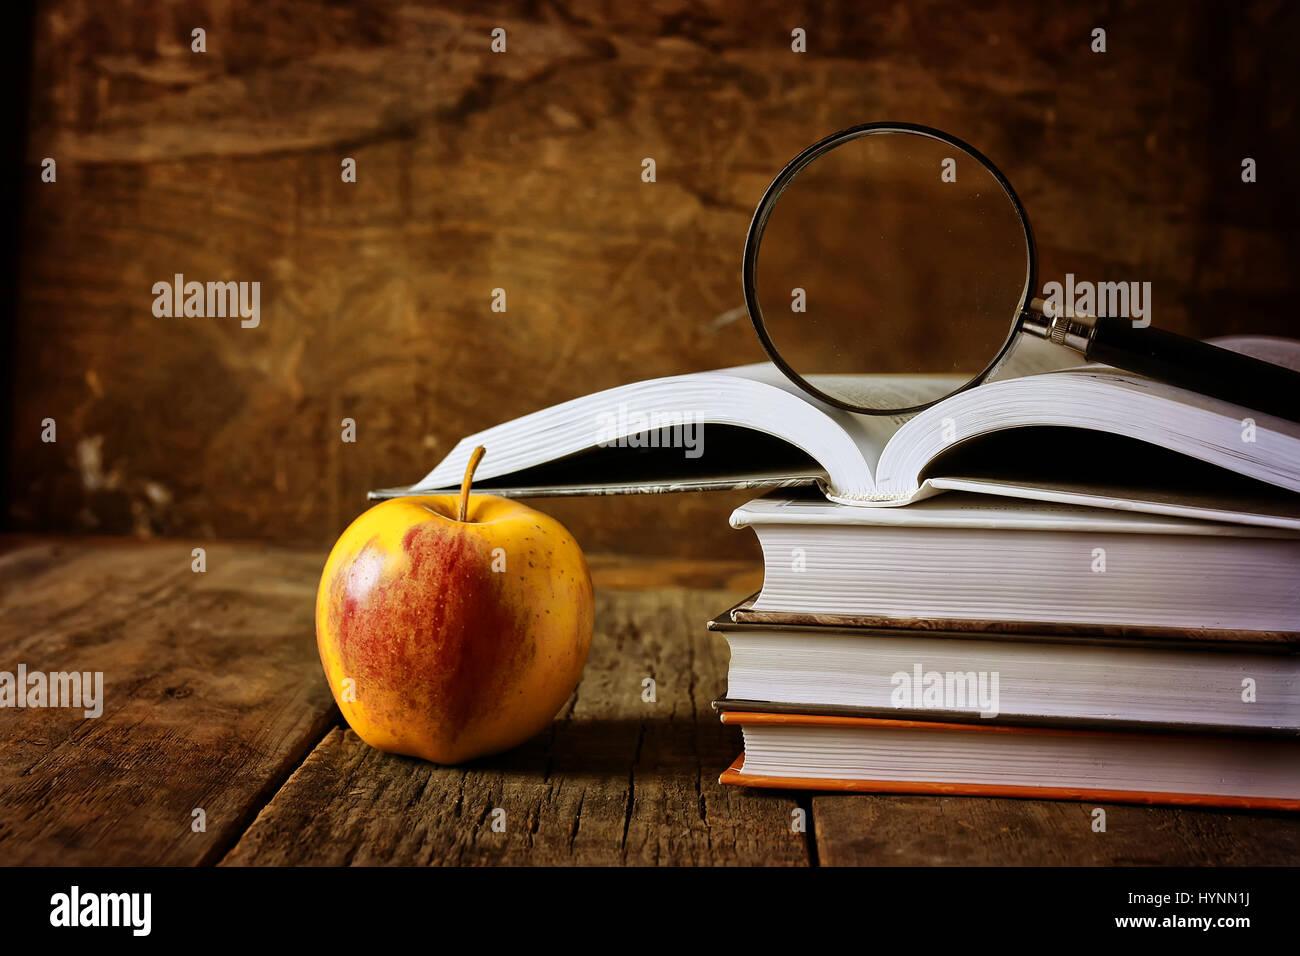 Lupa libro educación Foto de stock